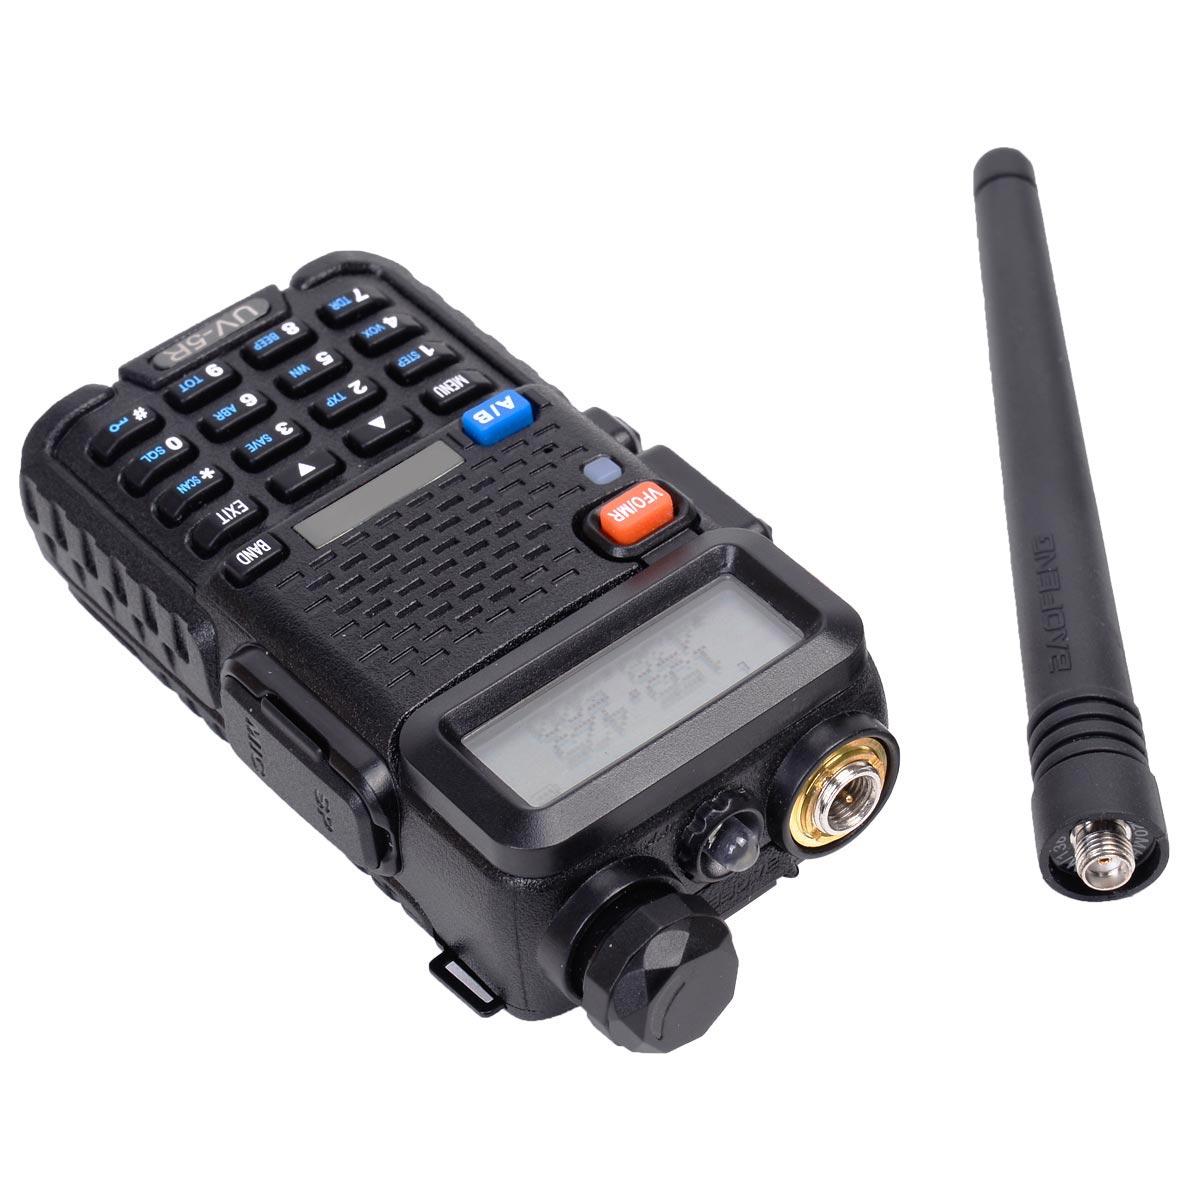 Baofeng UV-5R VHF/UHF 136-174/400-520 Dual-Band DCS DTMF CTCSS Walkie Talkies Two-way Radio EU Adapter<br><br>Aliexpress